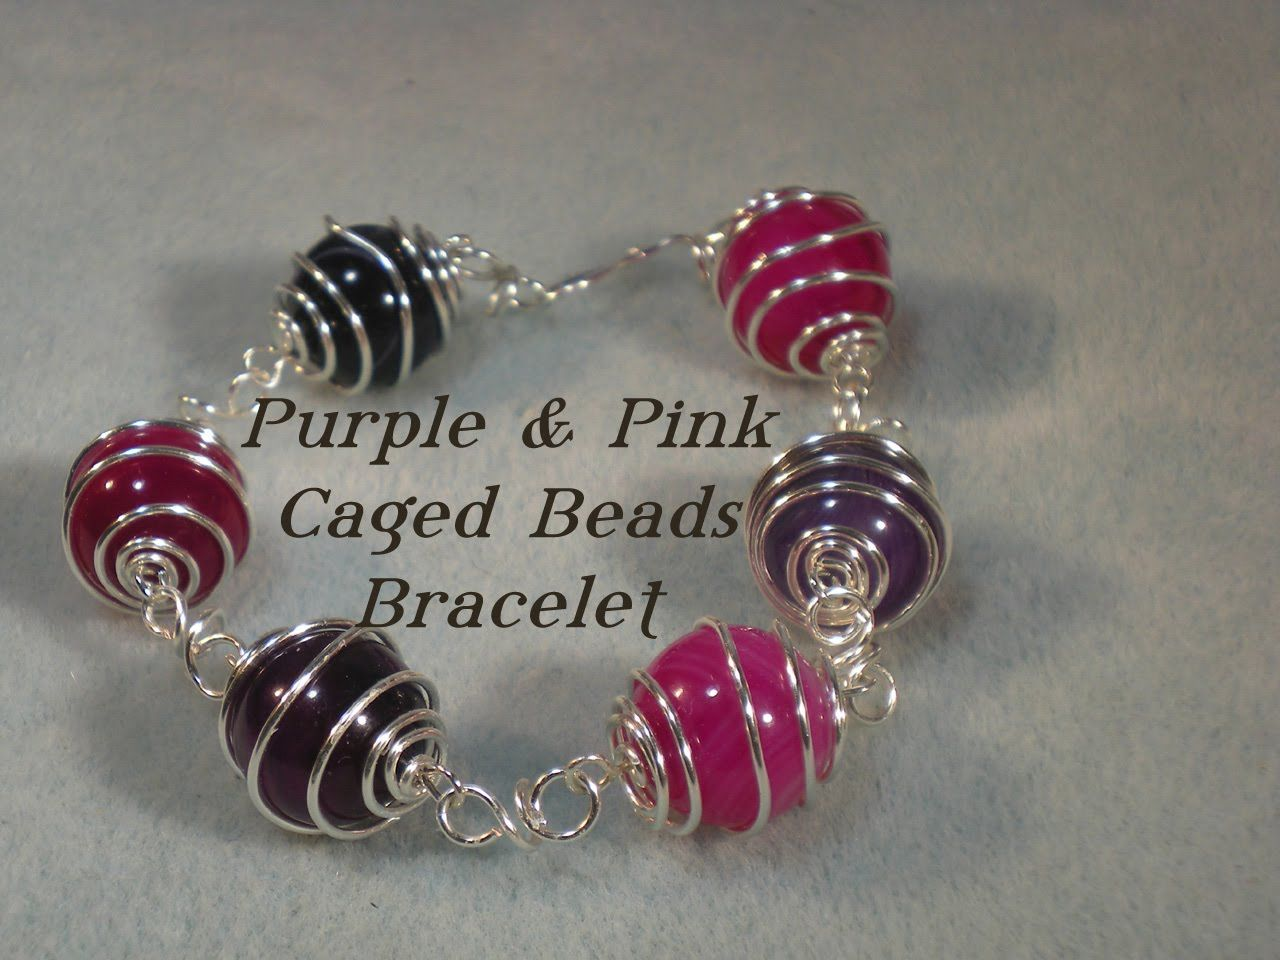 Wirework Caged Bead Bracelet Video | Jewelry | Pinterest | Beads ...